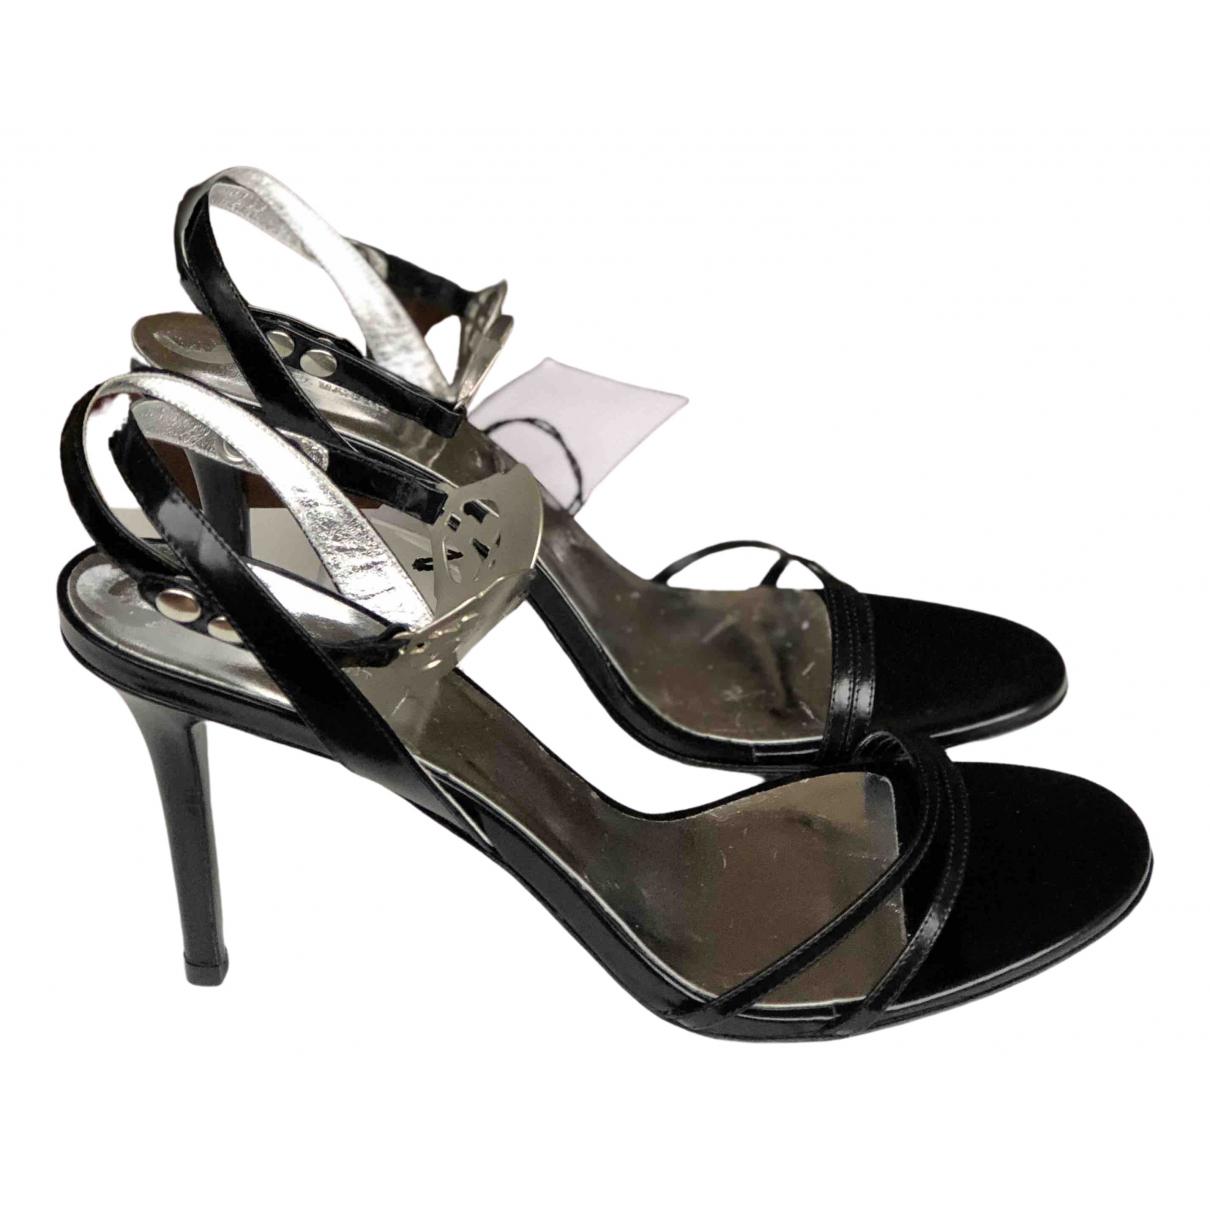 Isabel Marant \N Black Patent leather Sandals for Women 40 EU